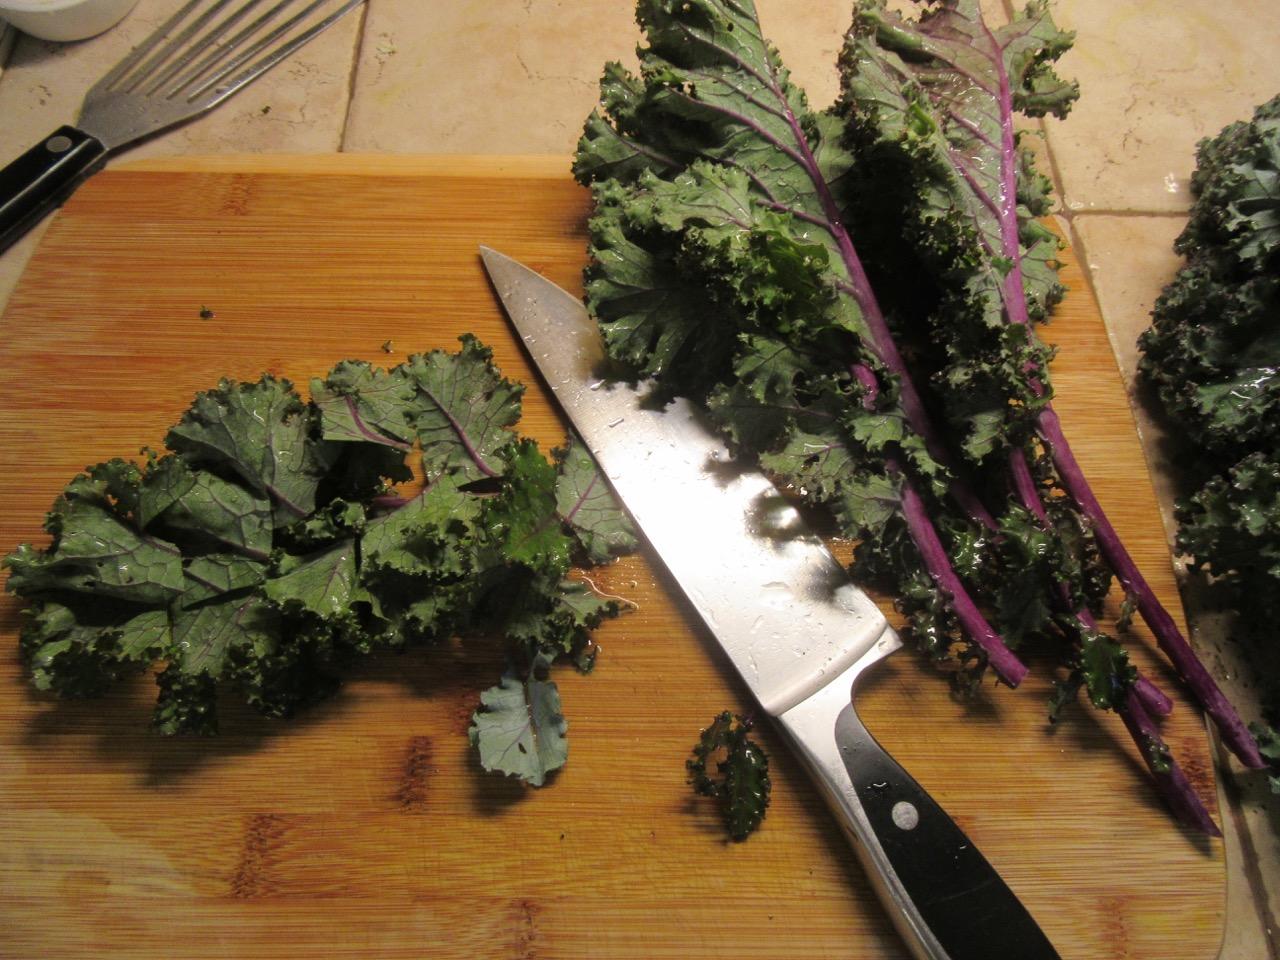 Kale chopping